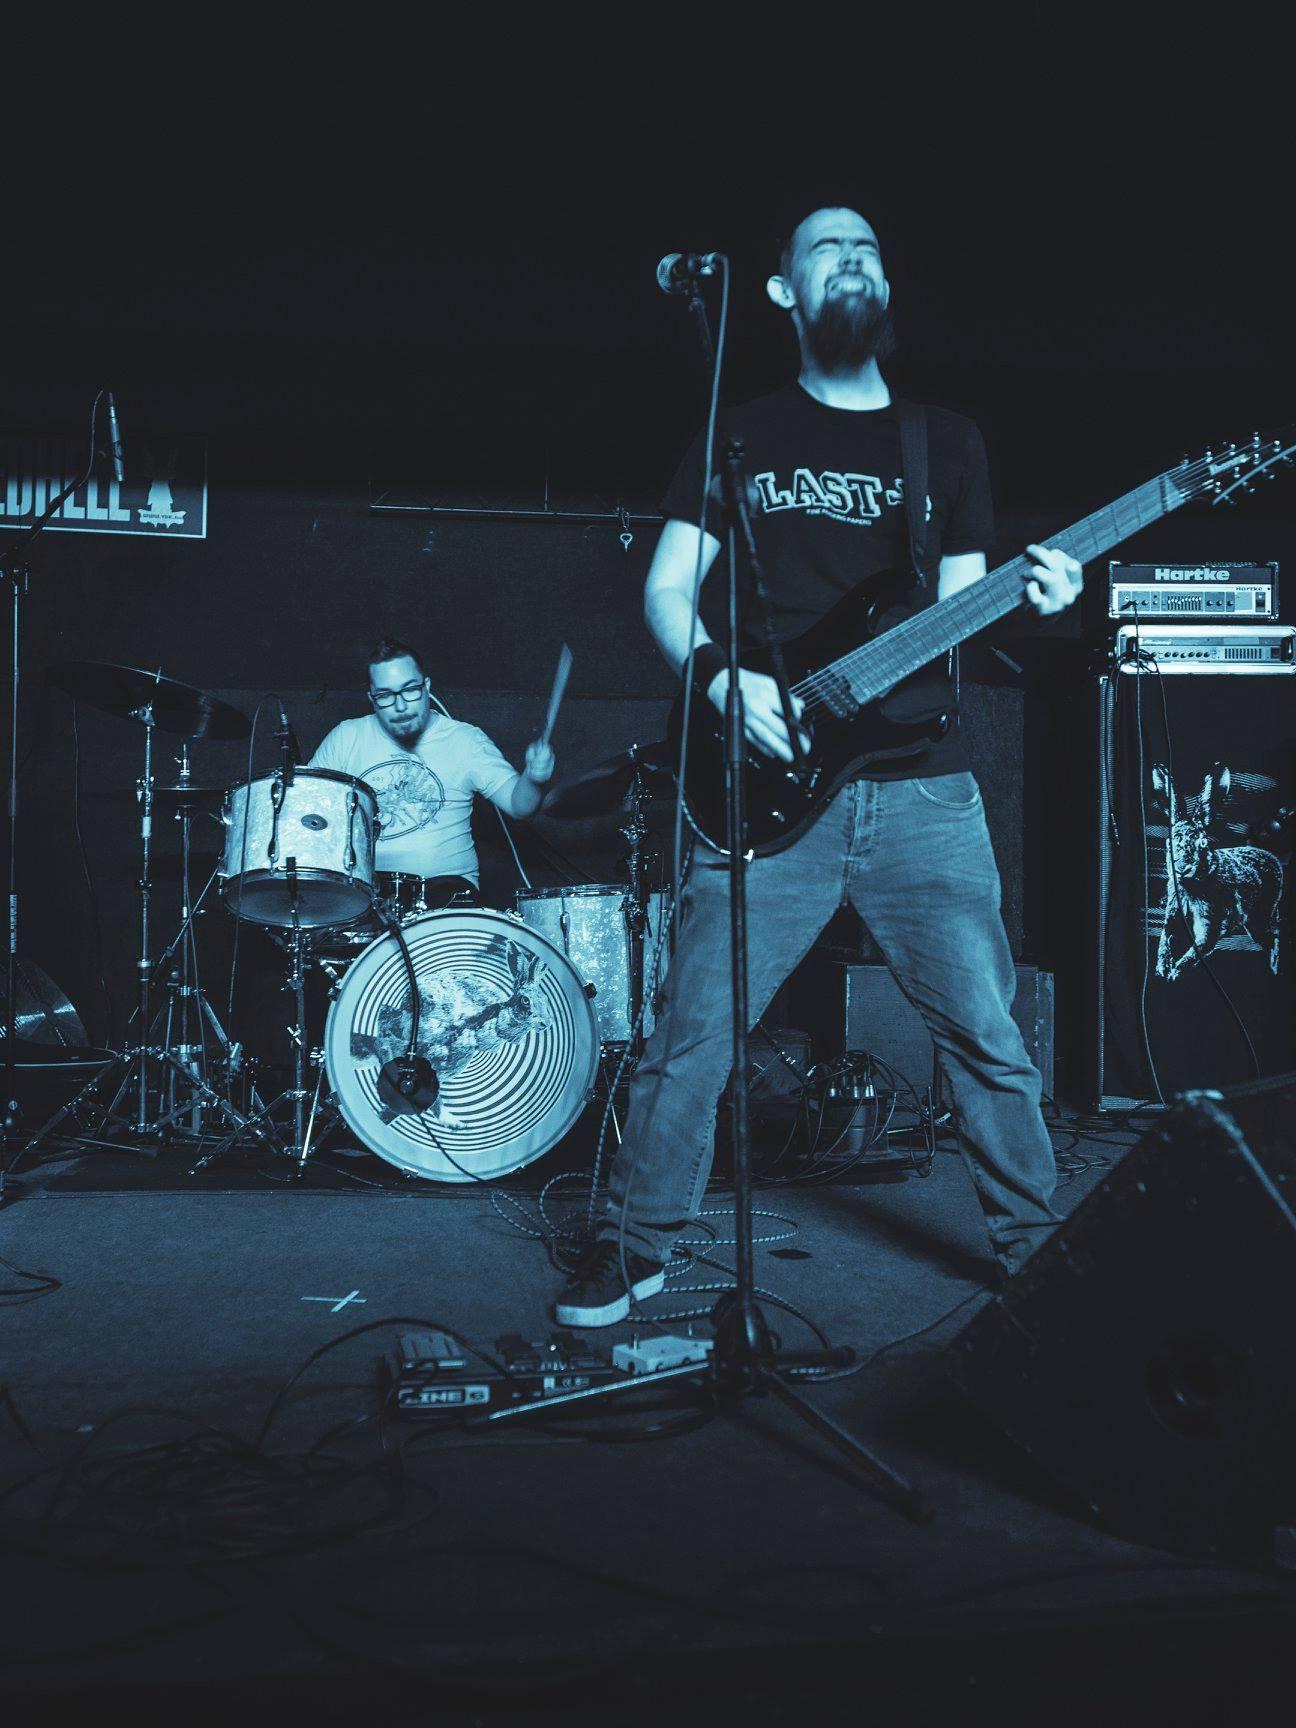 vanta_band_photo_live1_photo_by_adam_balint_tadder_muvek.jpg